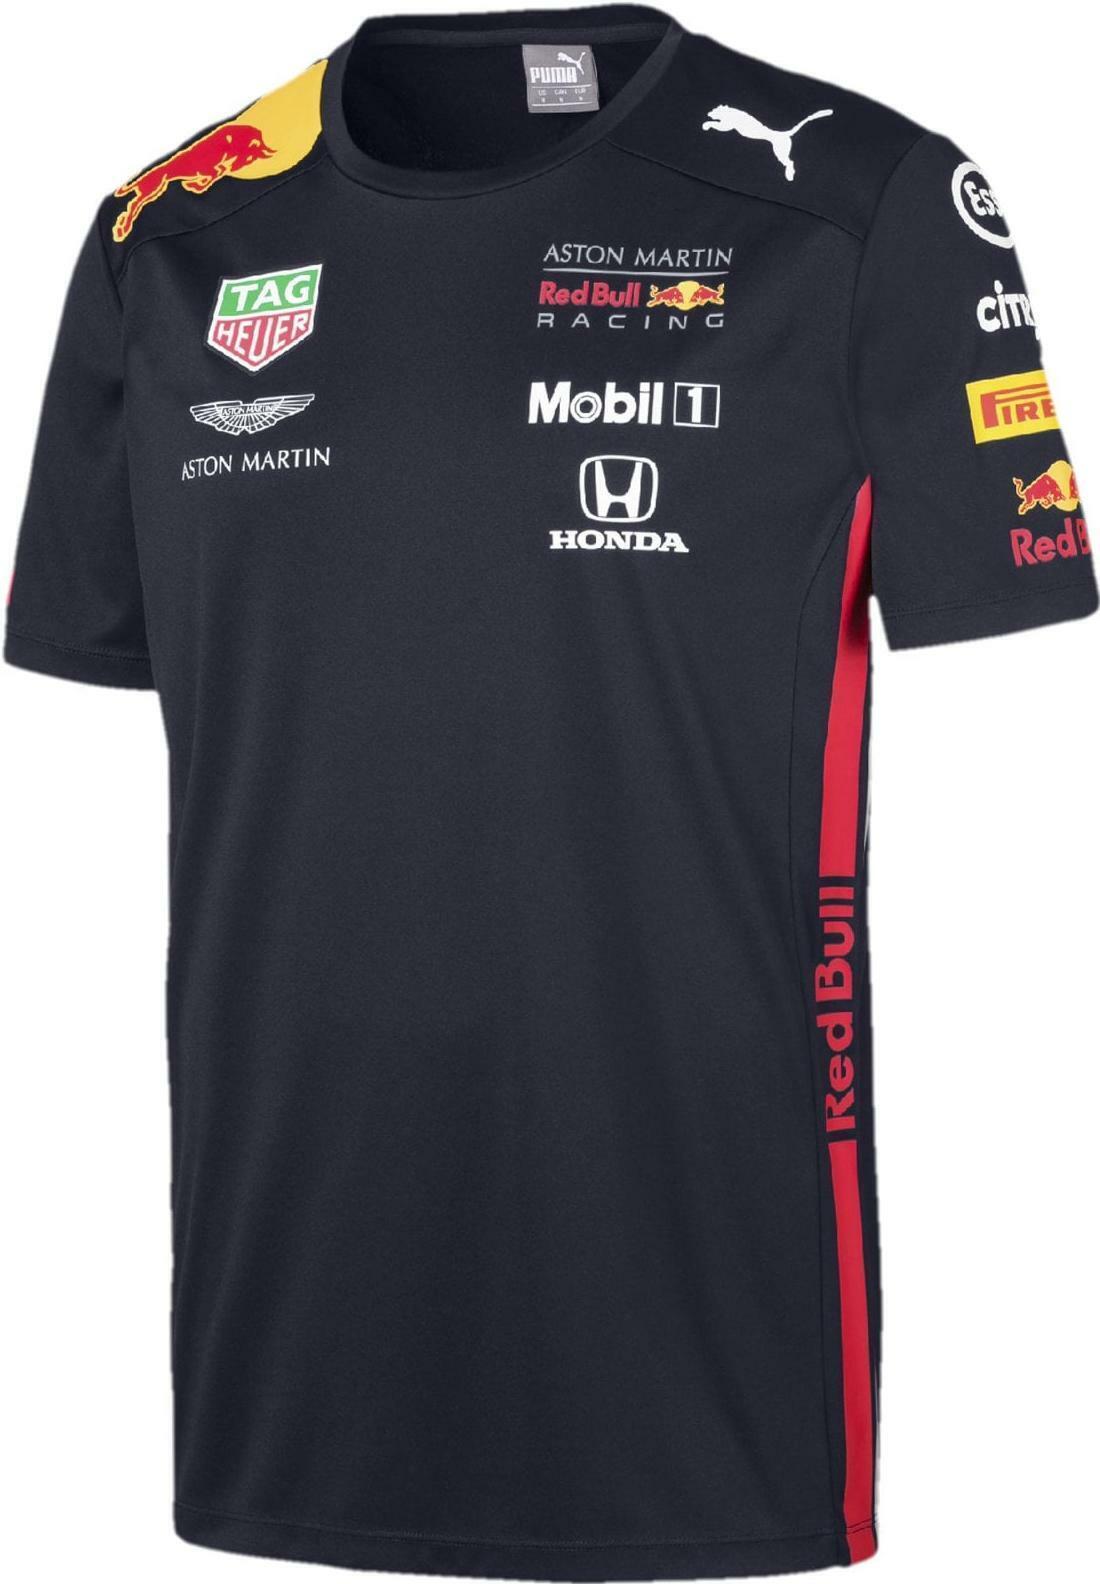 Aston Martin Red Bull Racing F1™  Mens Team T-Shirt 2019